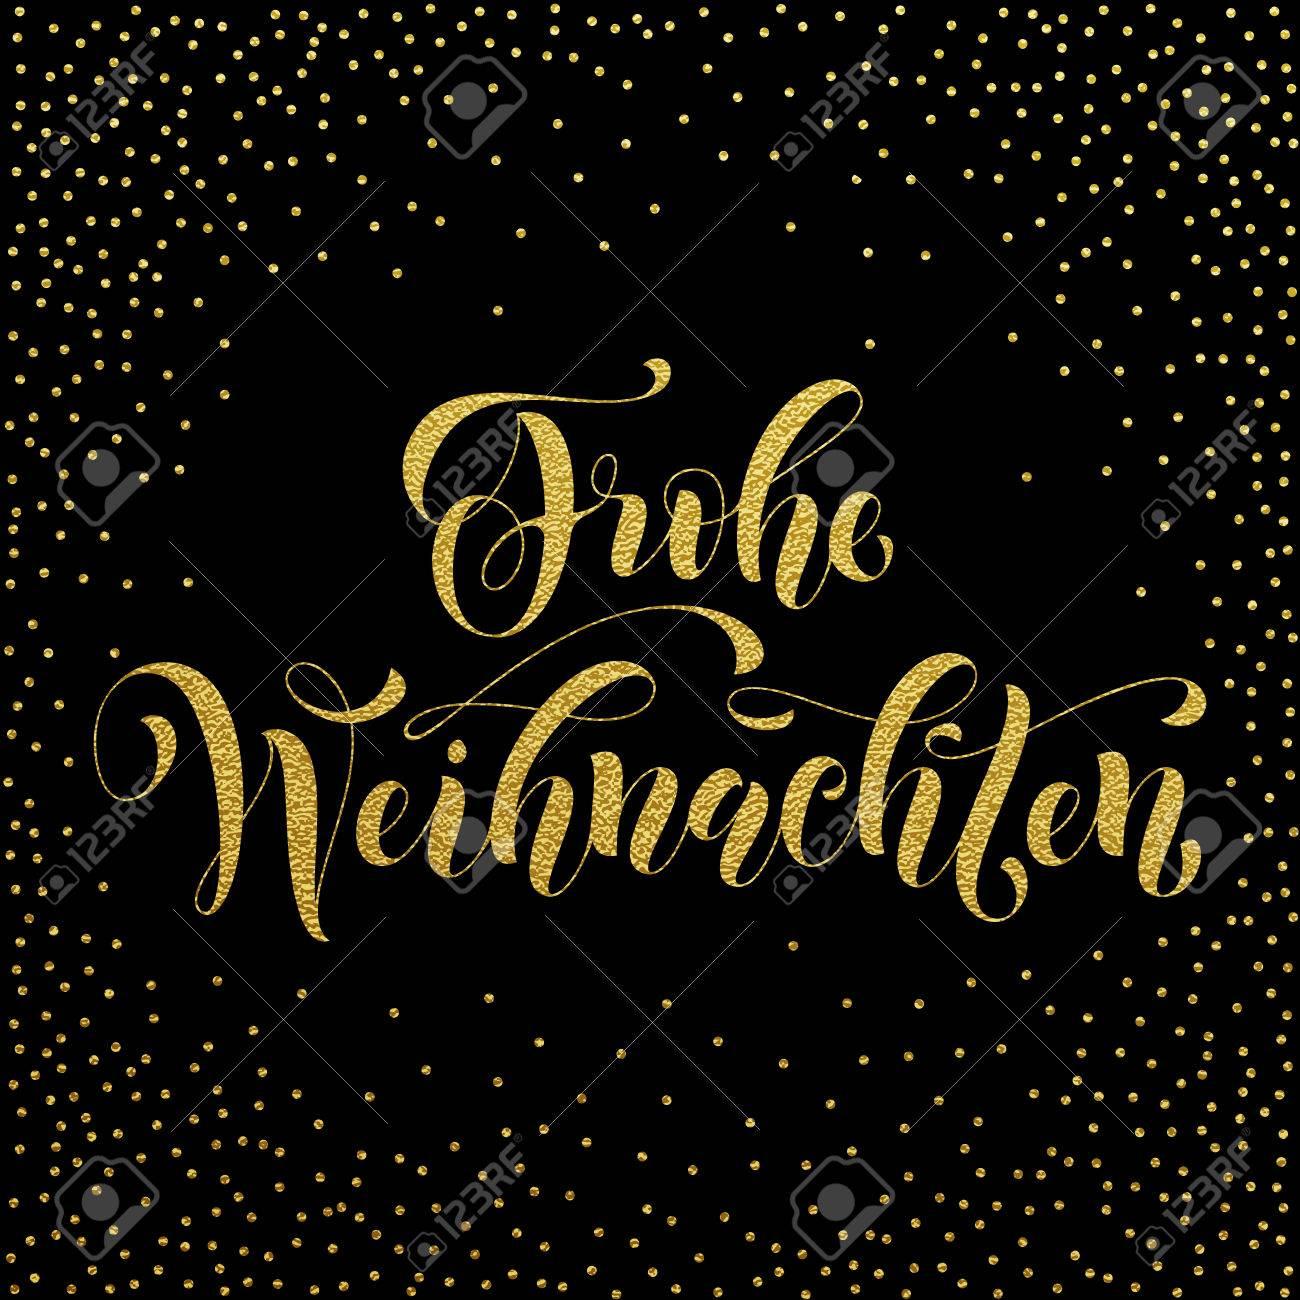 Frohe Weihnachten Gold.Frohe Weihnachten German Christmas Gold Glitter Lettering For